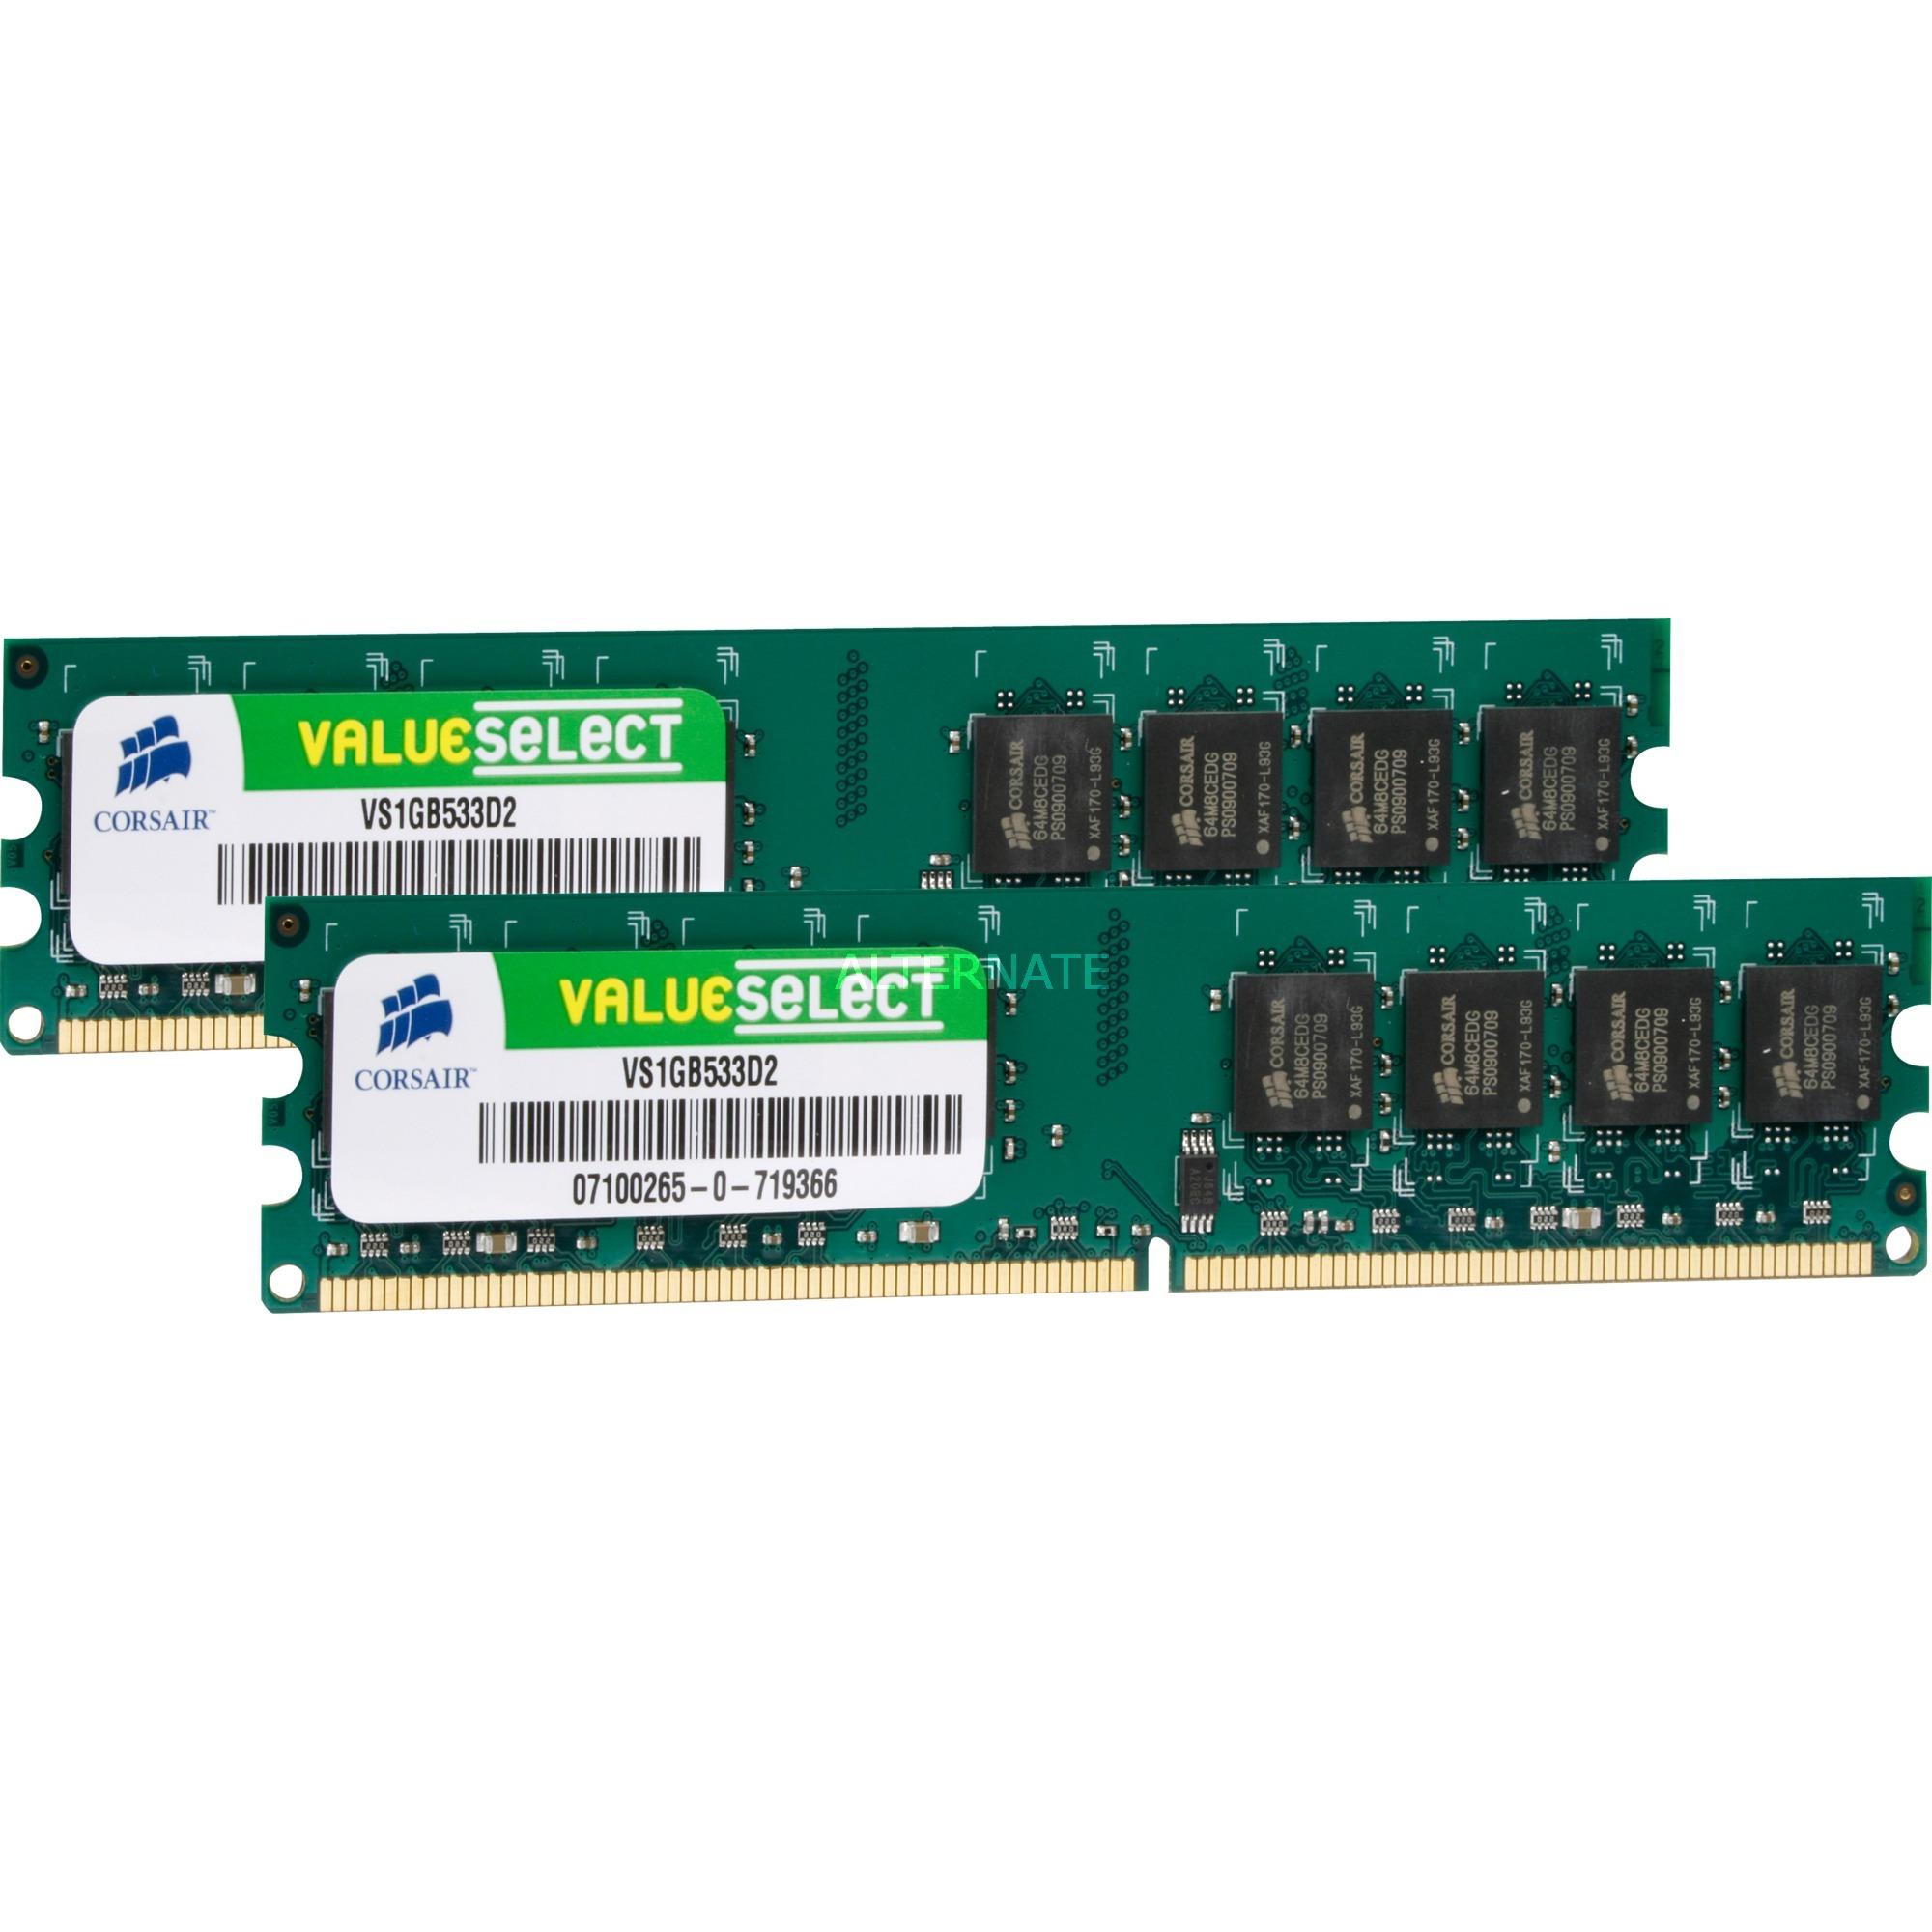 2GB DDR2 SDRAM DIMMs 2GB DDR2 533MHz módulo de memoria, Memoria RAM